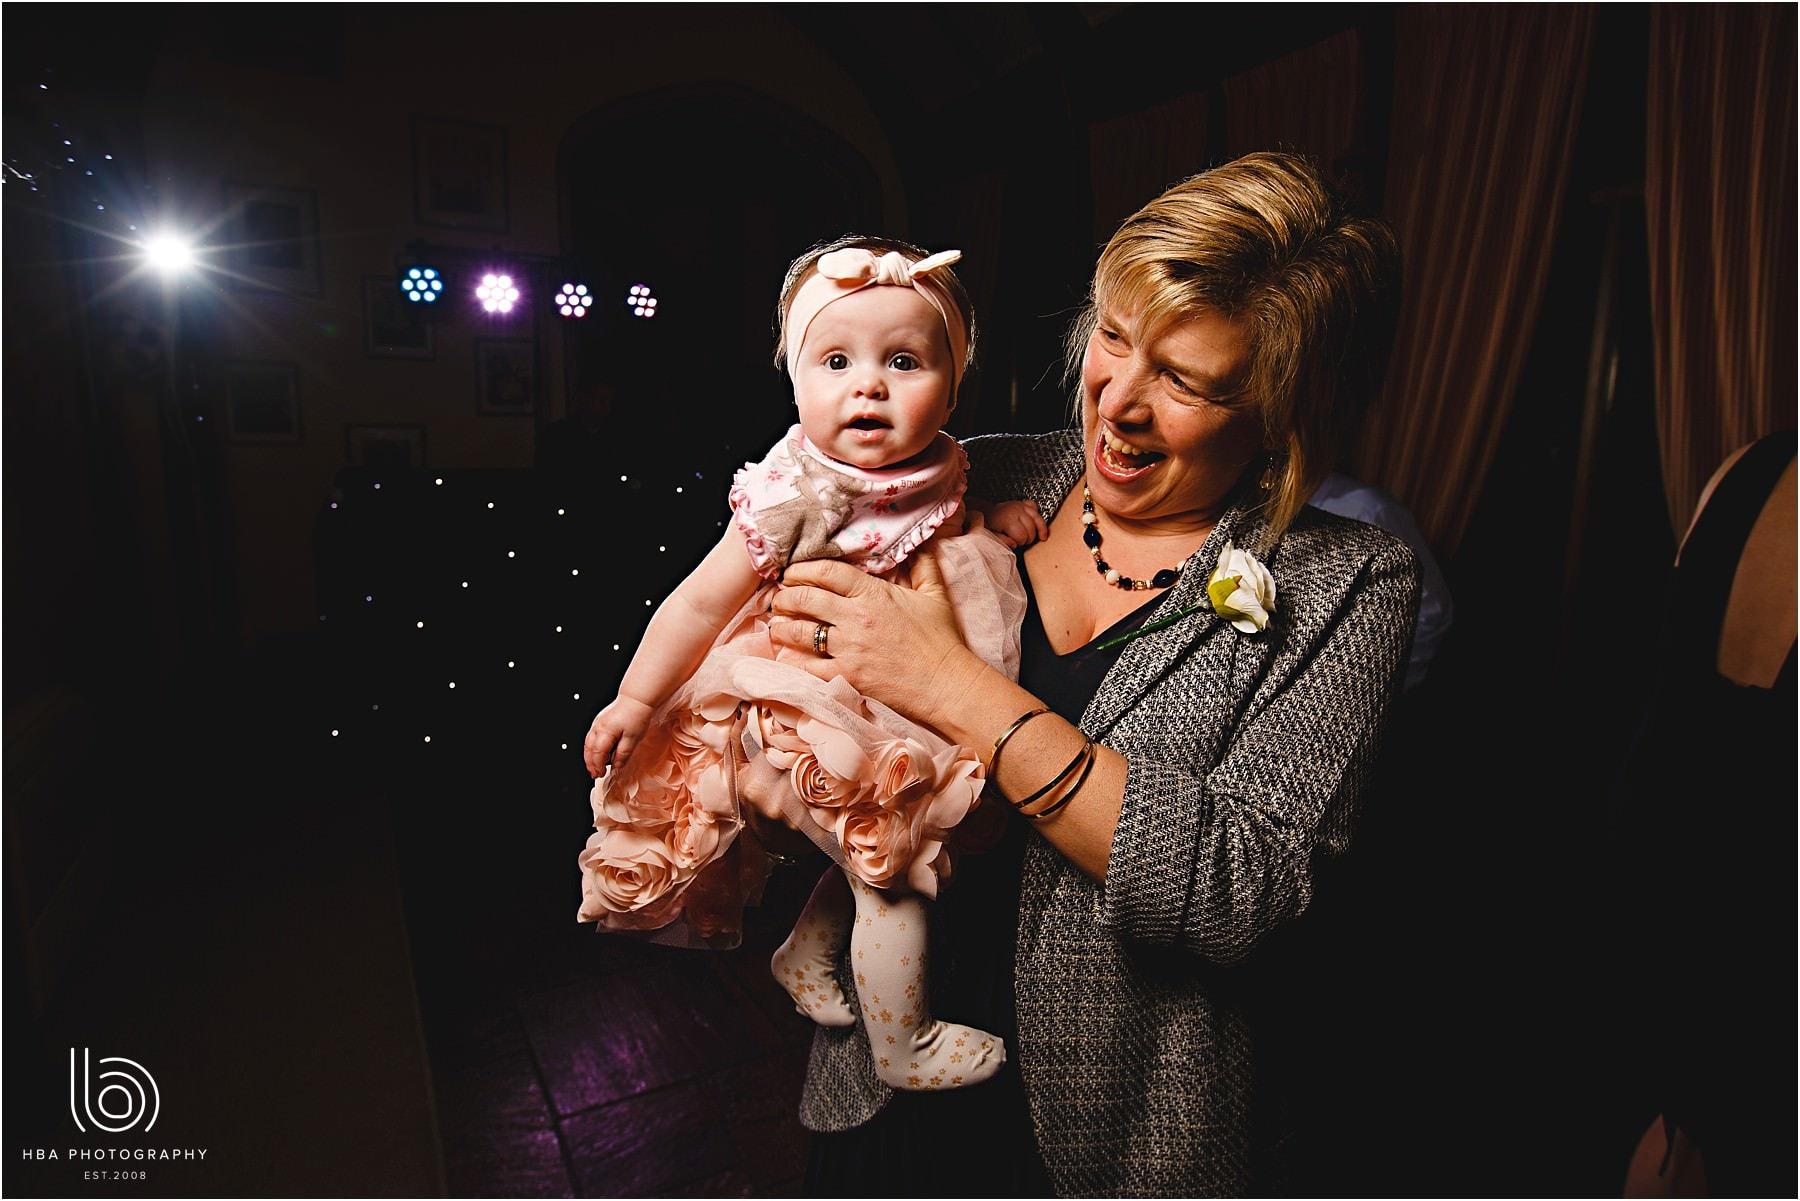 A baby on the dancefloor